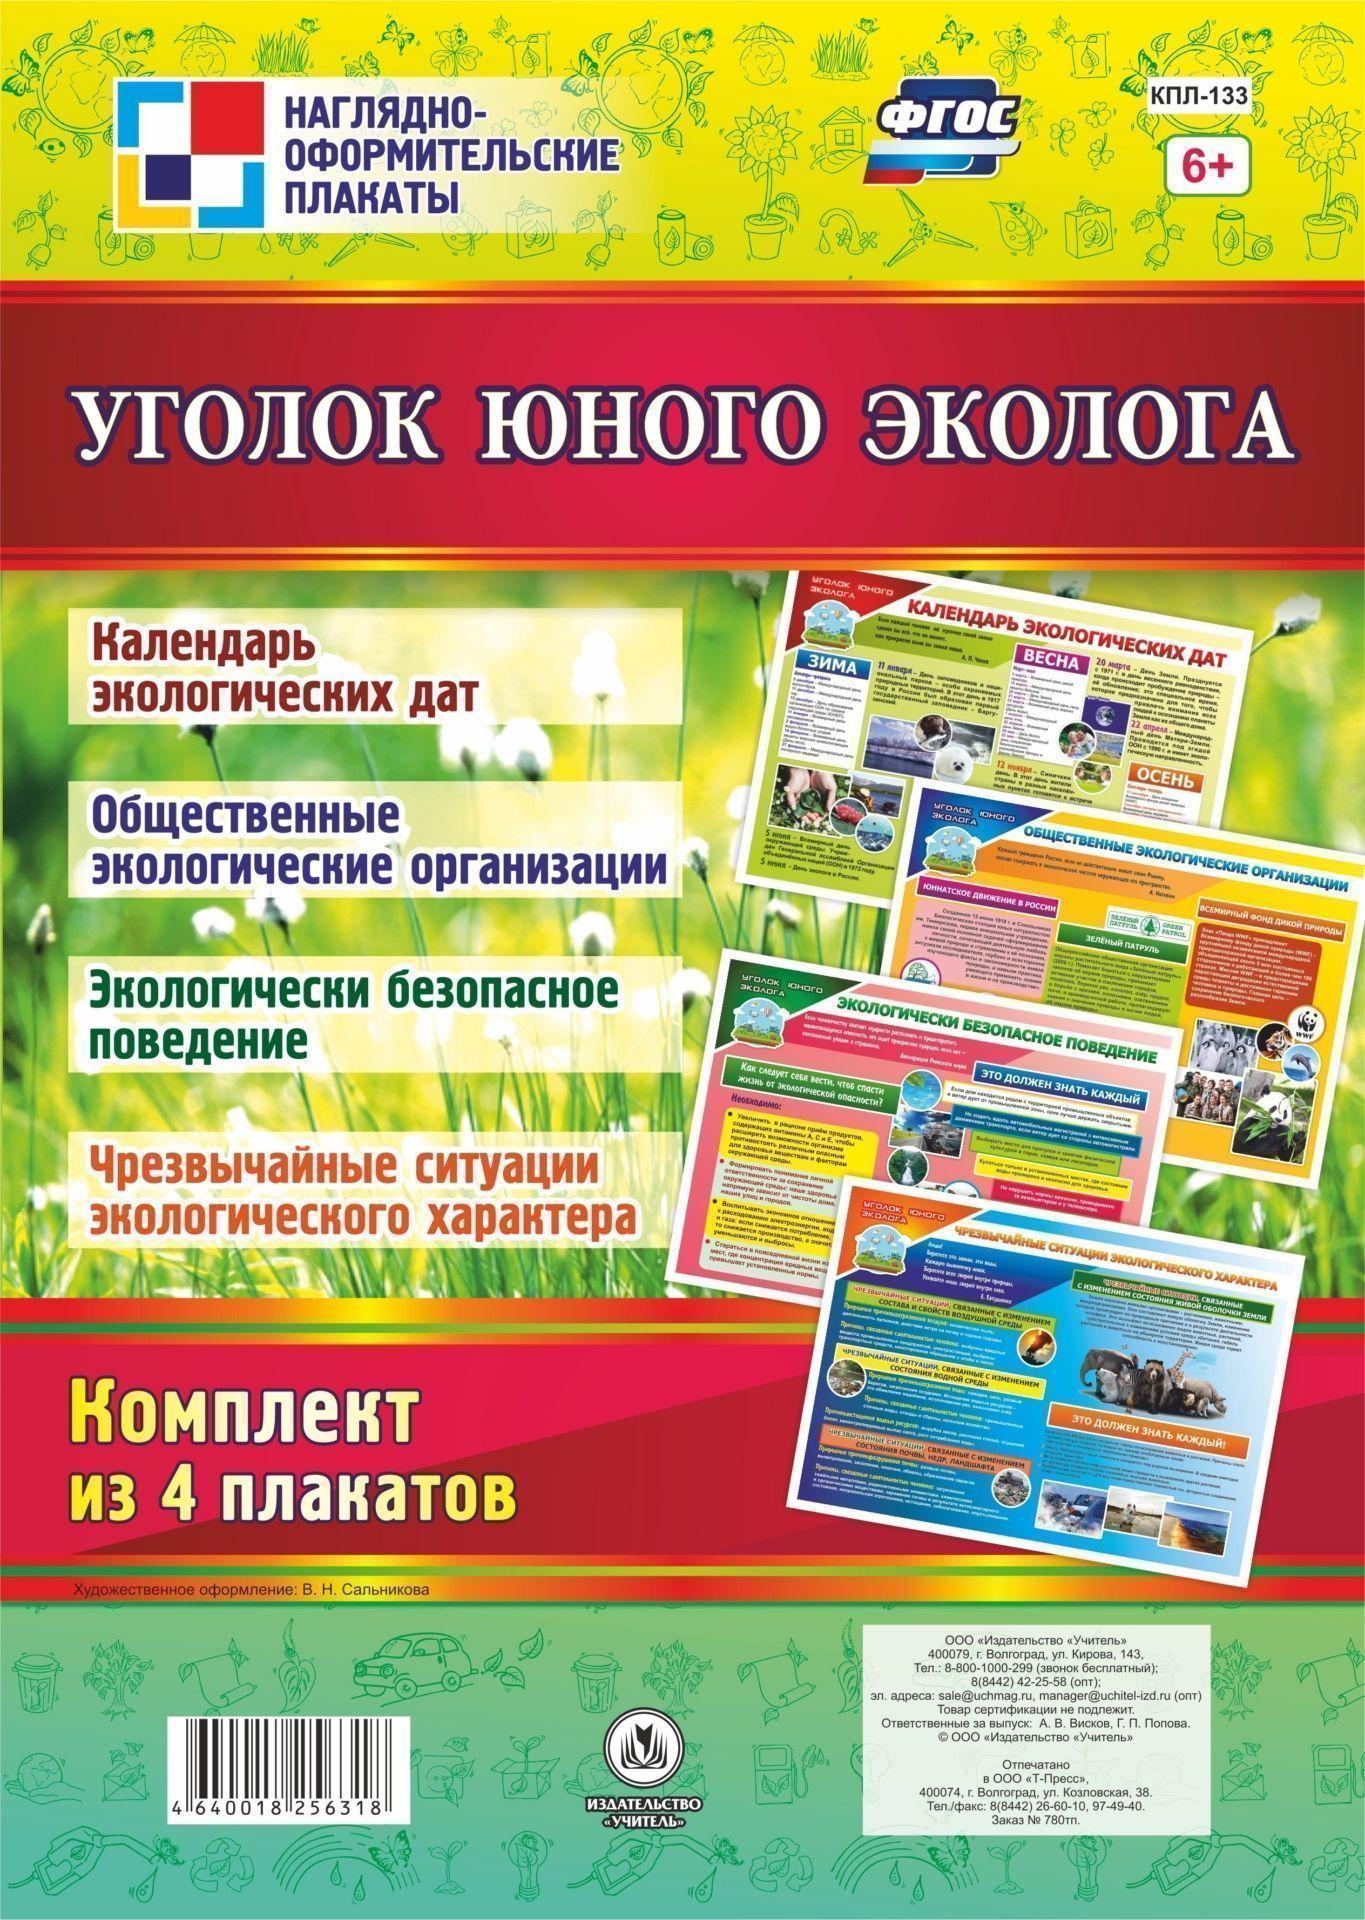 Комплект плакатов Уголок юного эколога: 4 плаката А2Тематические плакаты<br>.<br><br>Год: 2018<br>Серия: Наглядно-оформительские плакаты<br>Высота: 594<br>Ширина: 420<br>Переплёт: набор